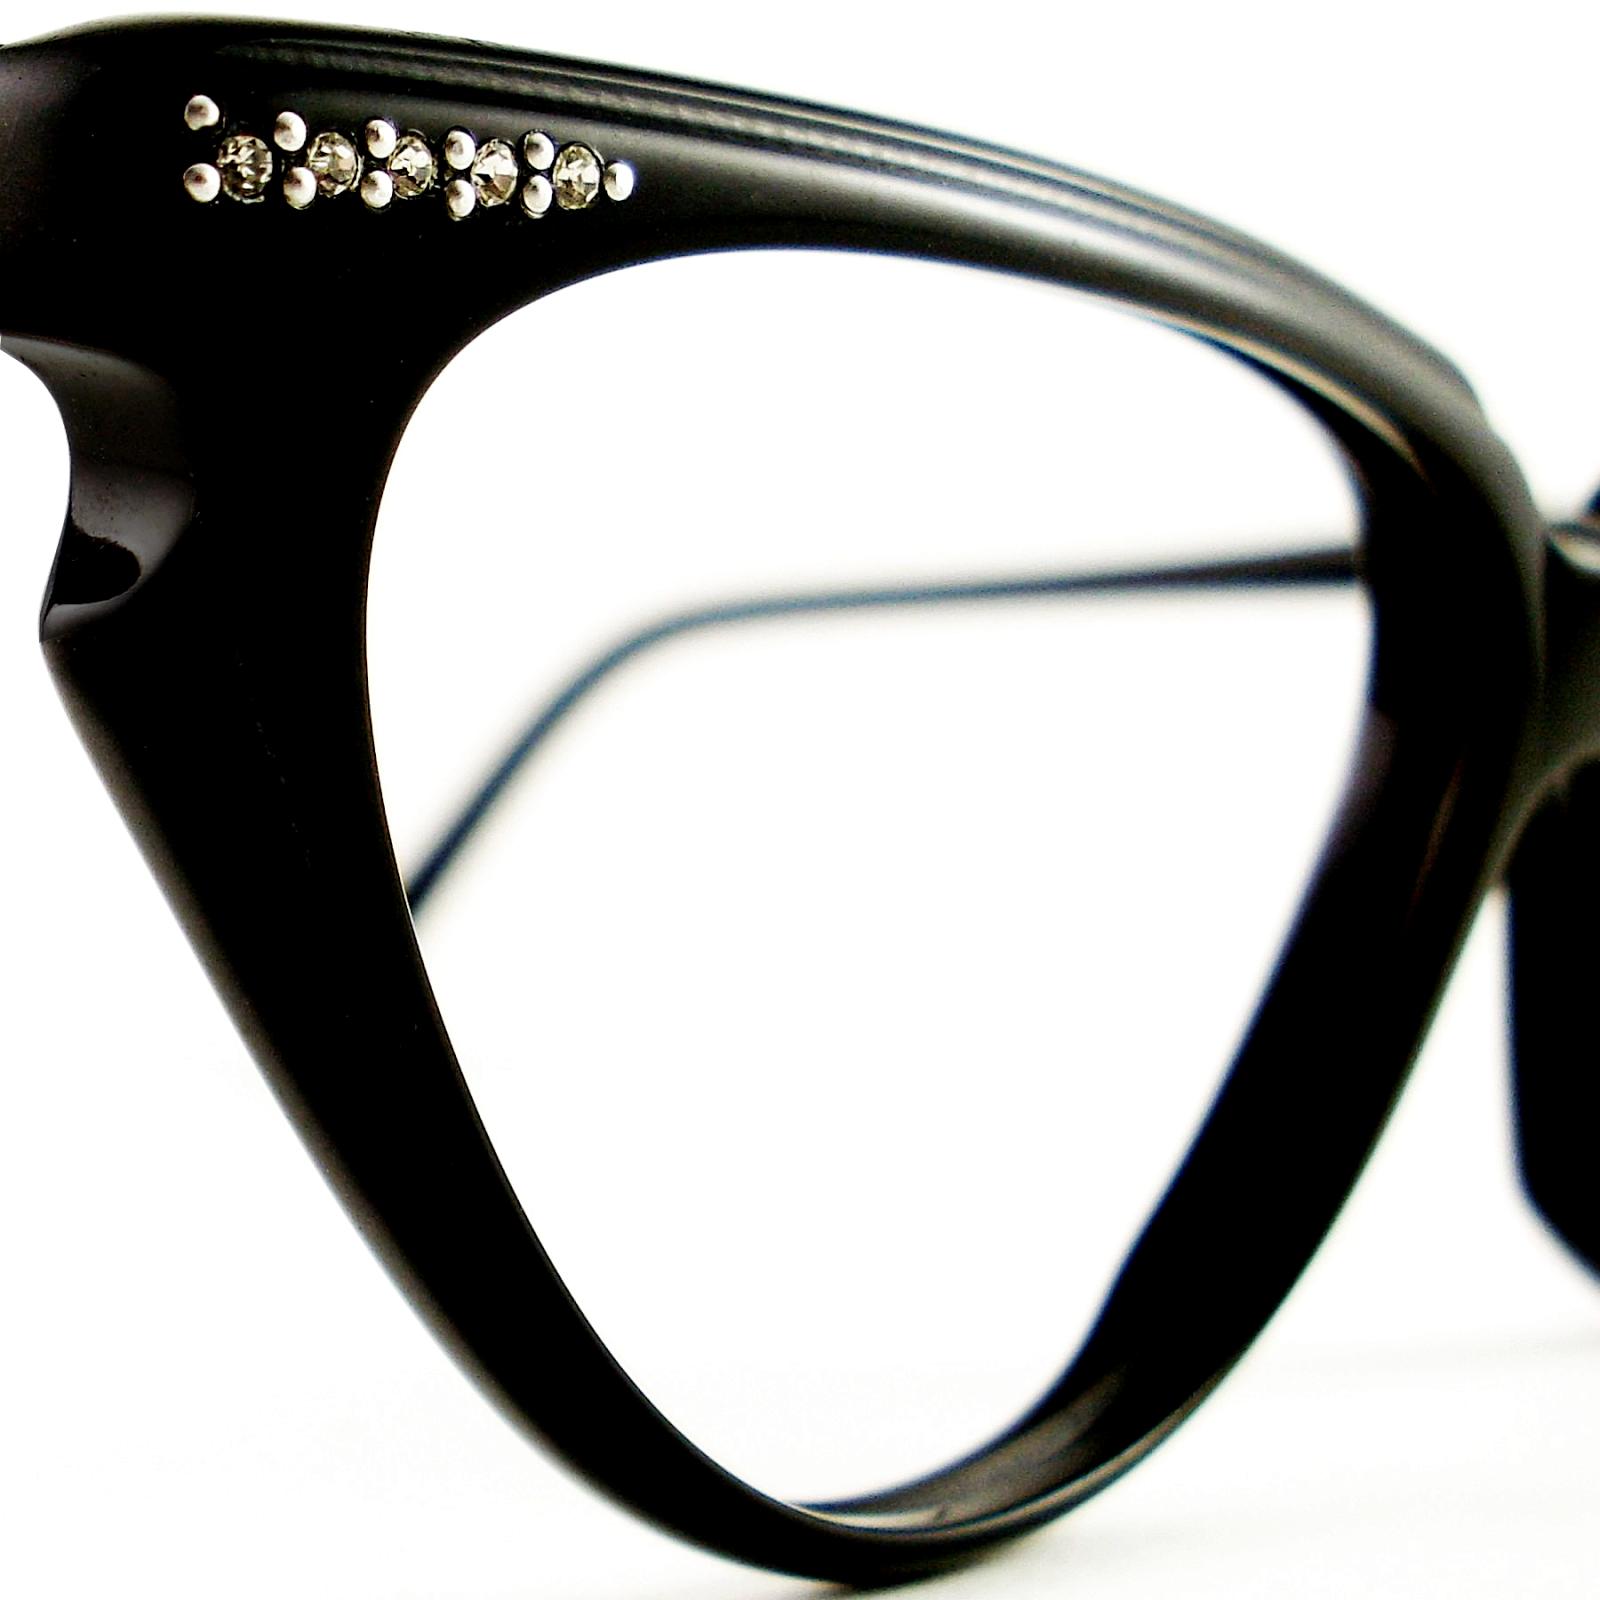 Vintage Eyeglasses Frames Eyewear Sunglasses 50S: April 2015